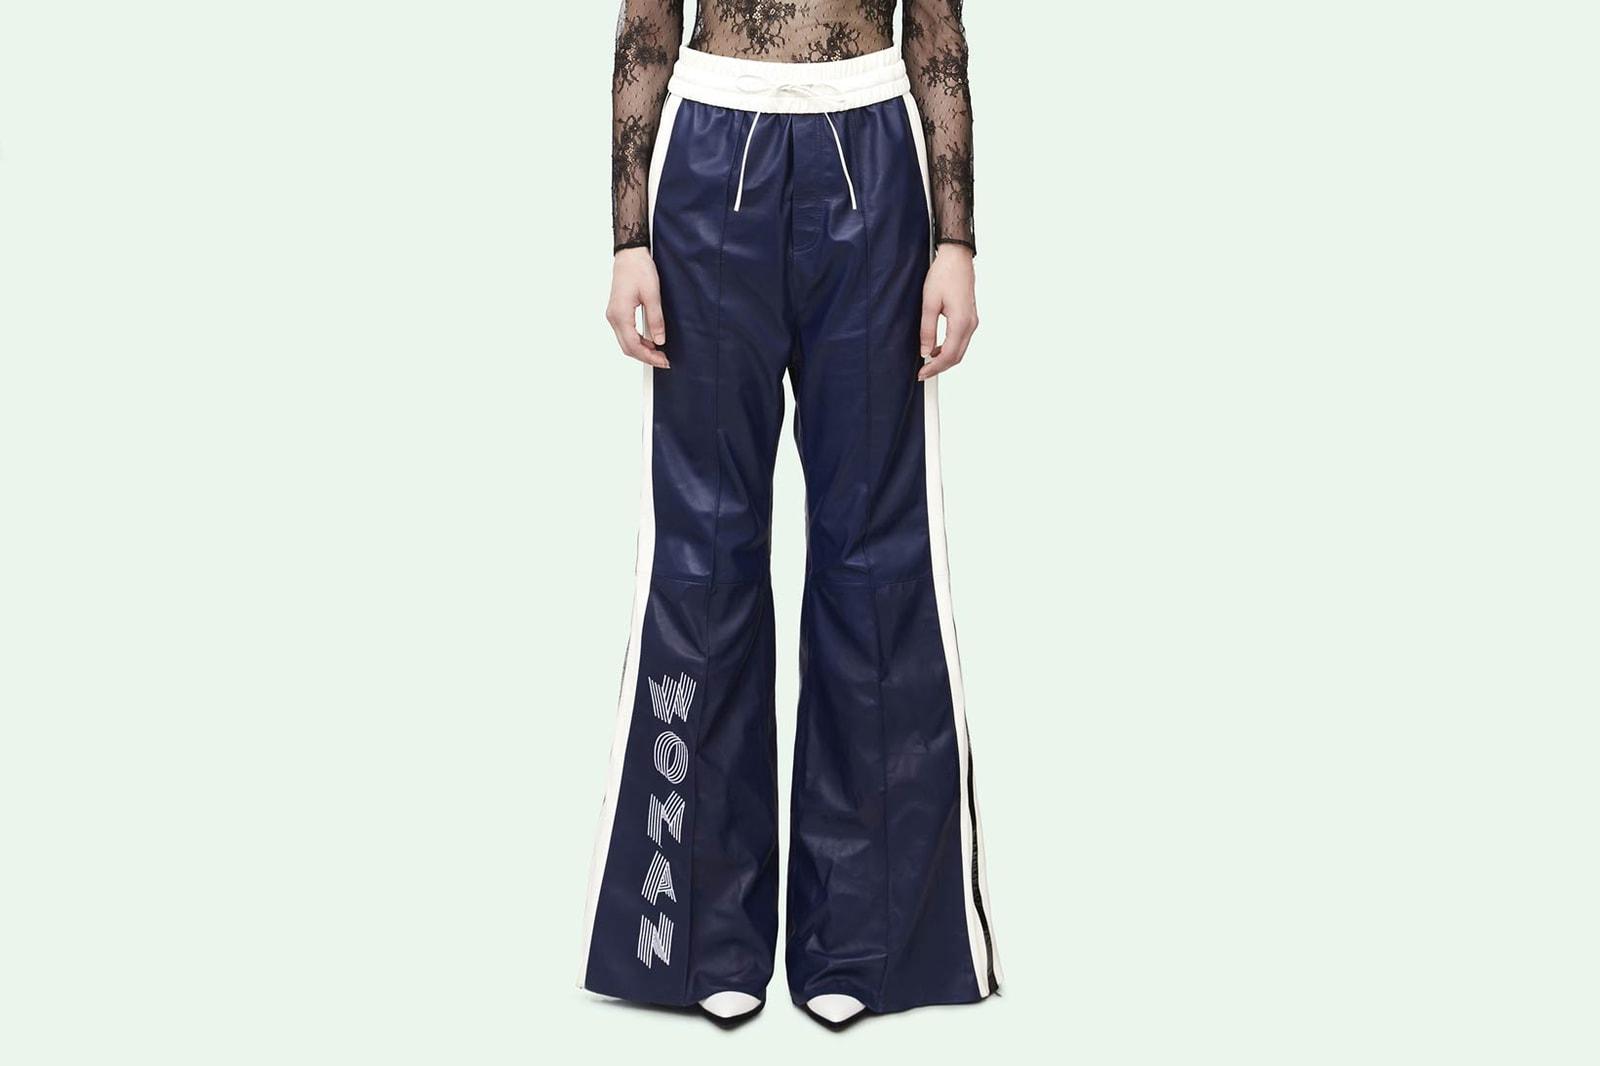 2018 New York Fashion Week Sami Miro